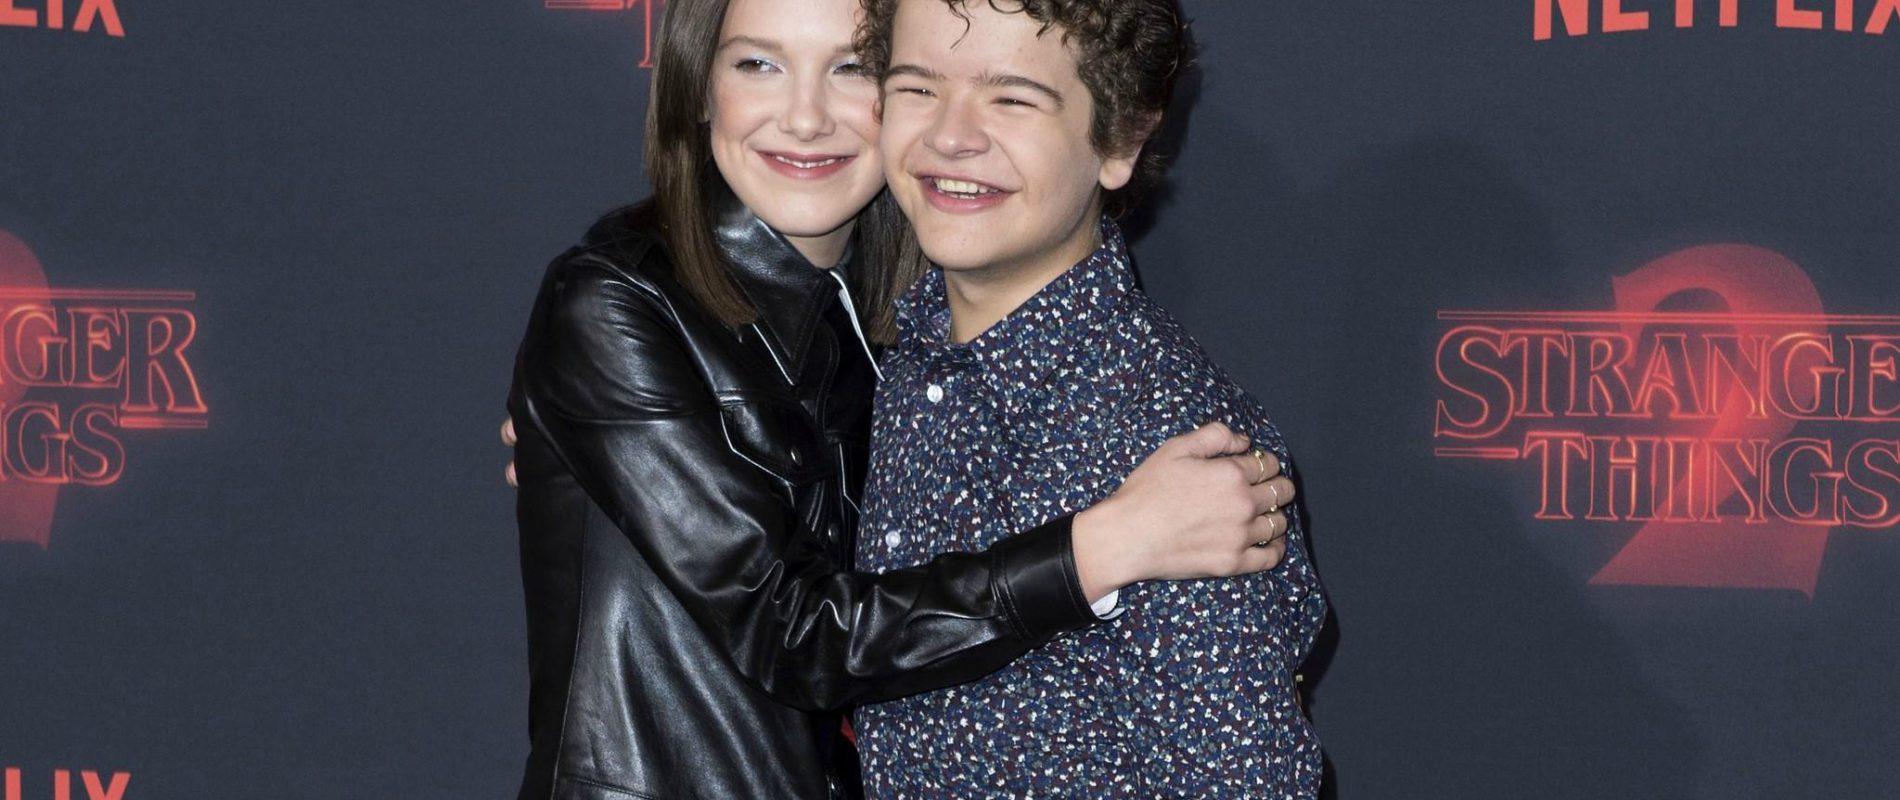 Gaten y Millie de Stranger Things ya fueron vacunados